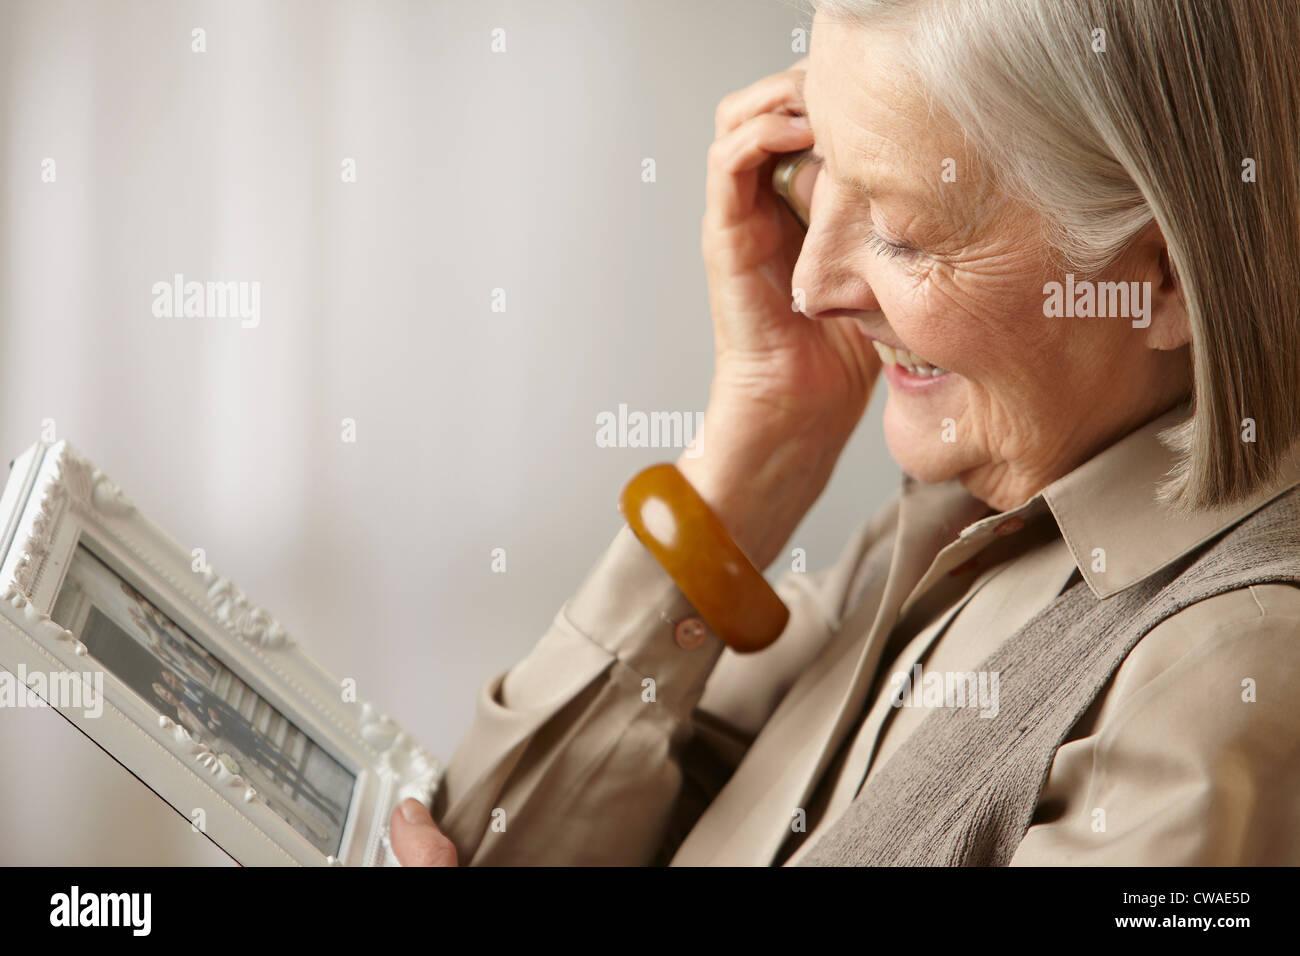 Ältere Frau mit Bilderrahmen Stockbild